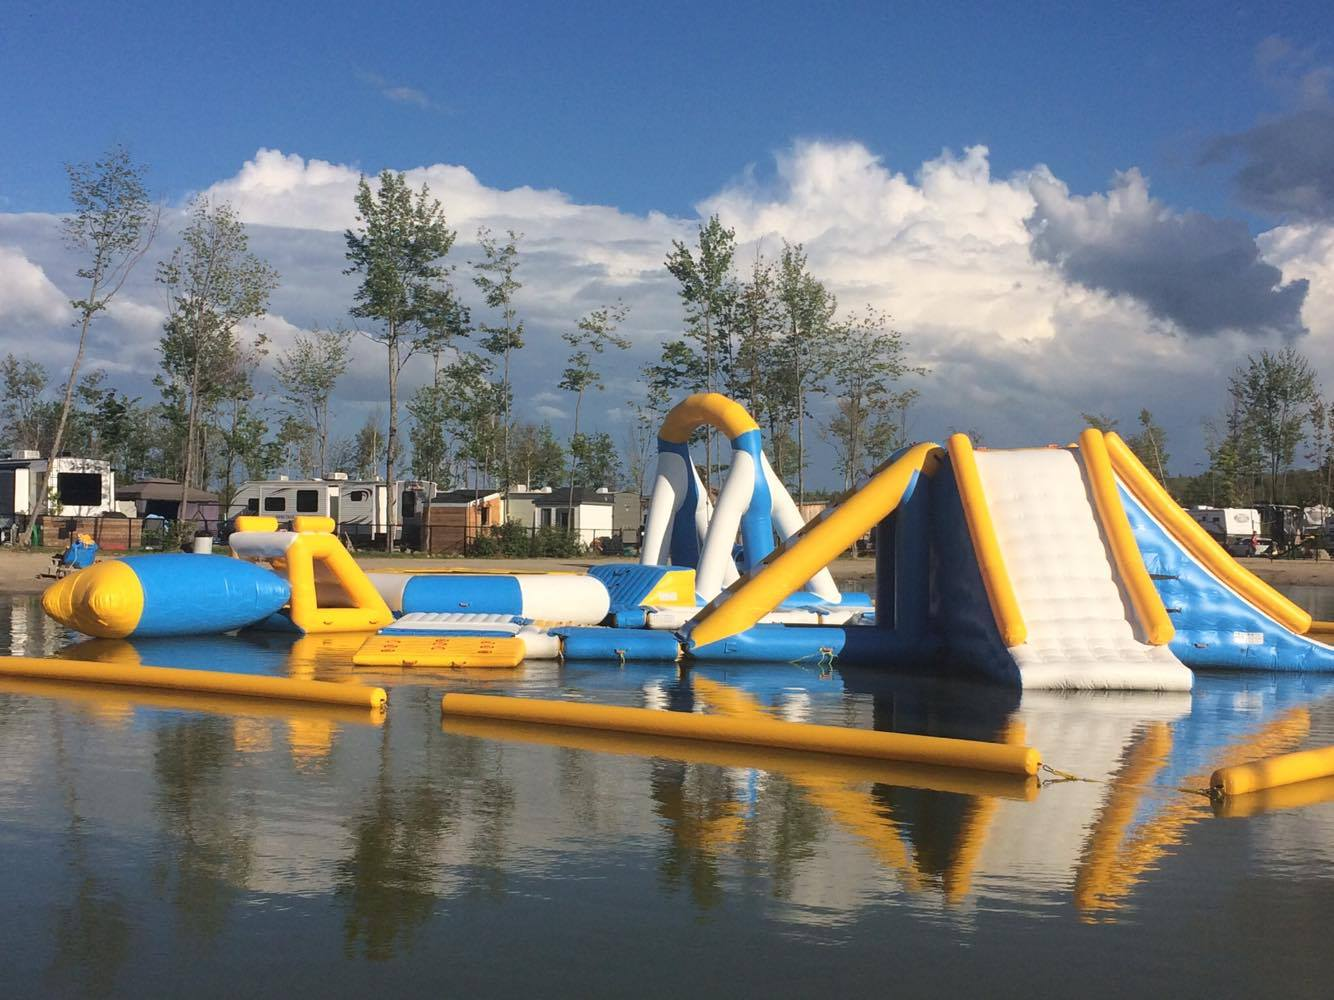 http://www.campingatlantide.com/wp-content/uploads/2017/07/parcours-gonflable-lac-complexe-atlantide-3.jpg